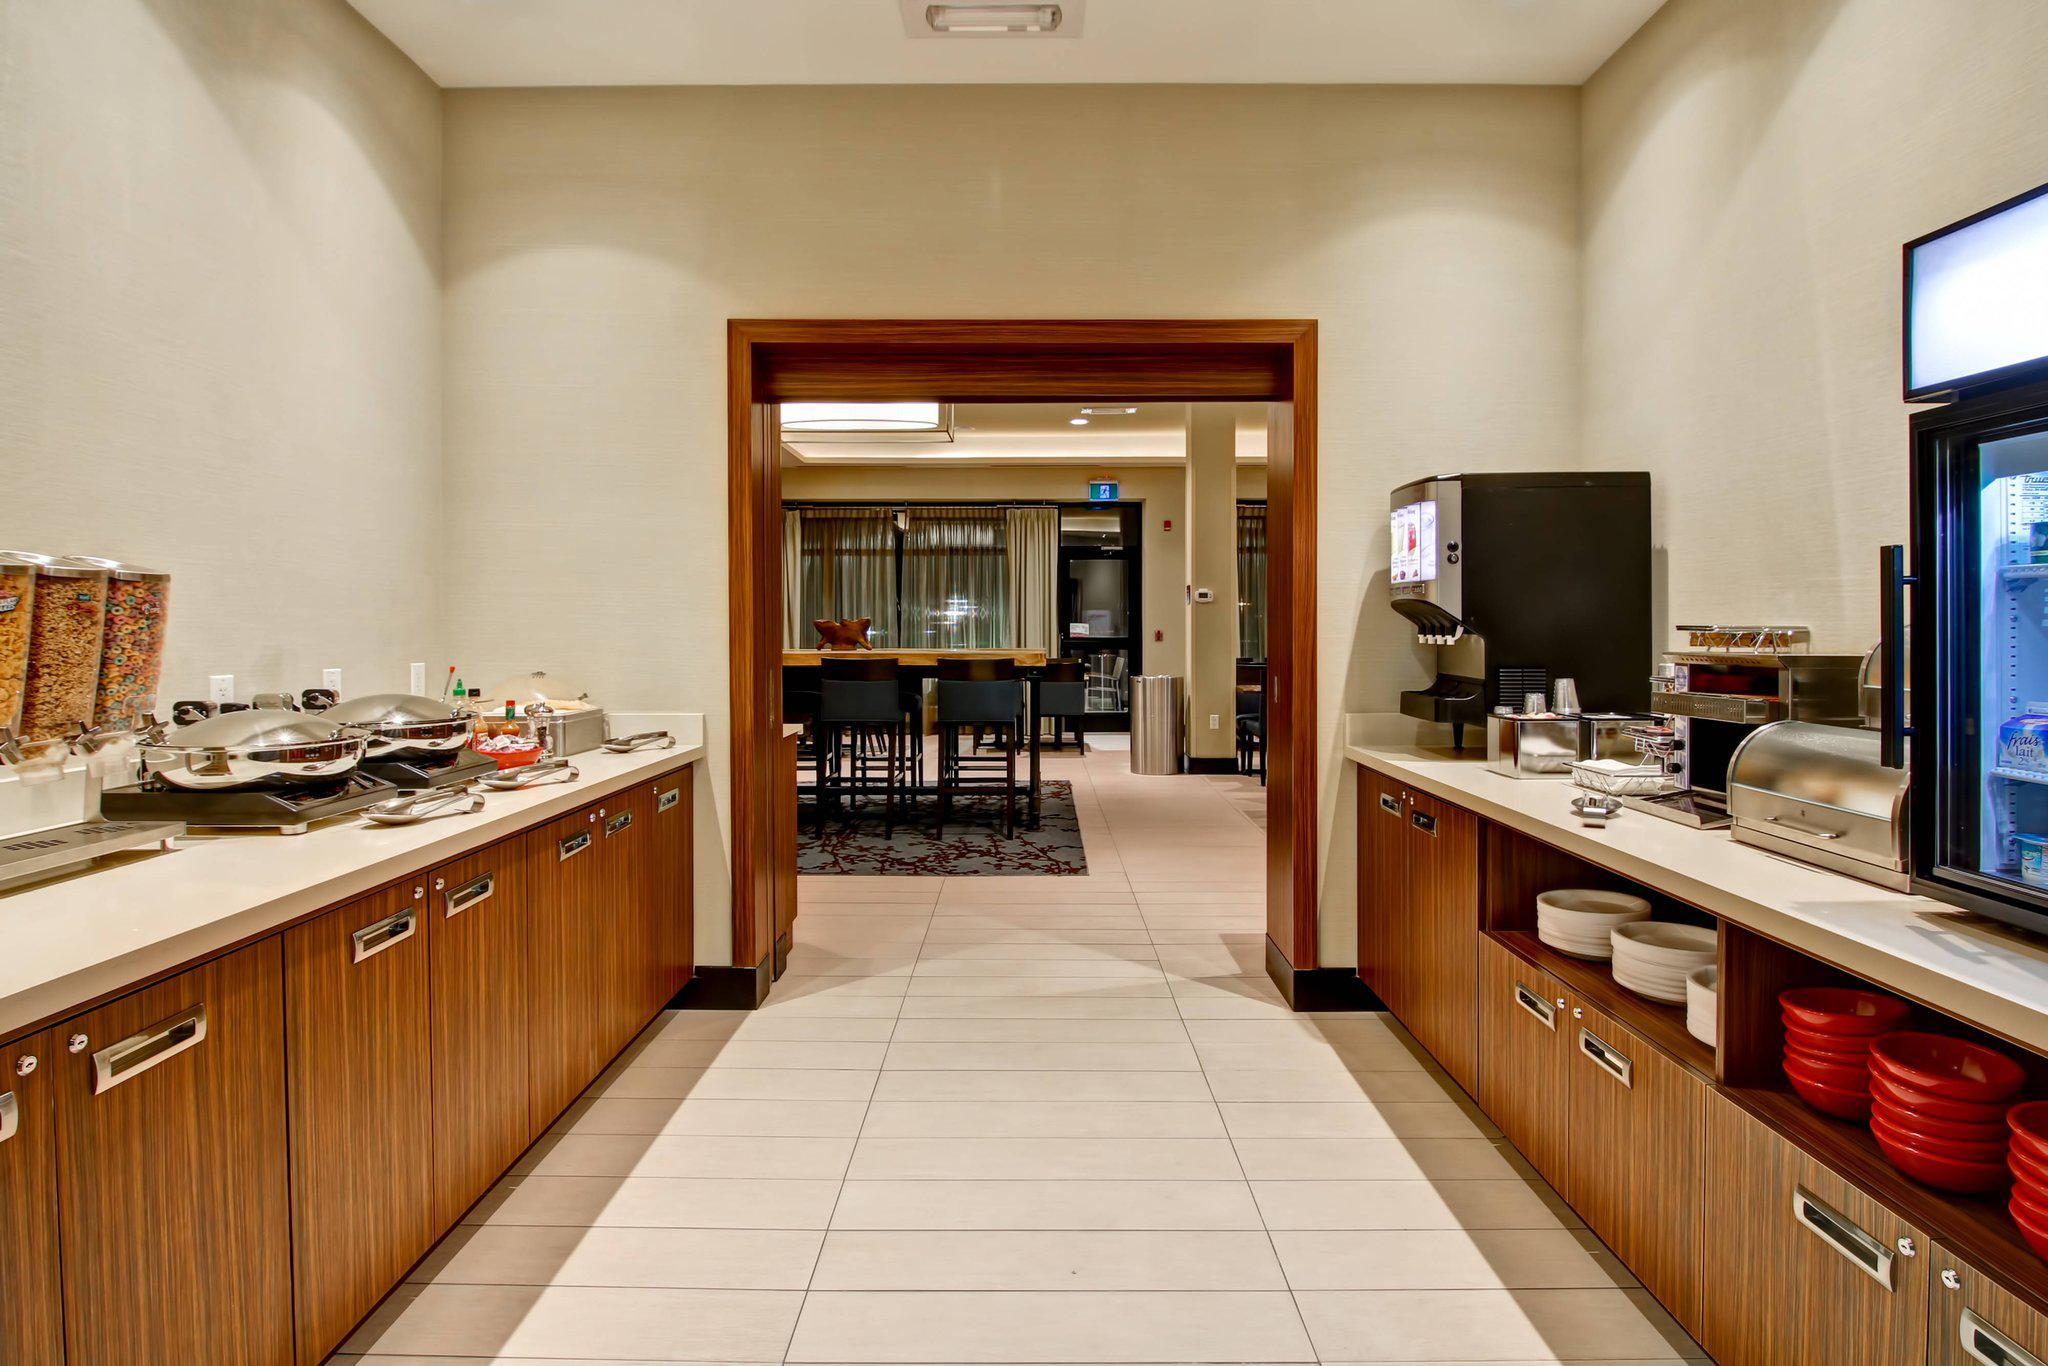 TownePlace Suites by Marriott Kincardine Kincardine (519)395-2665